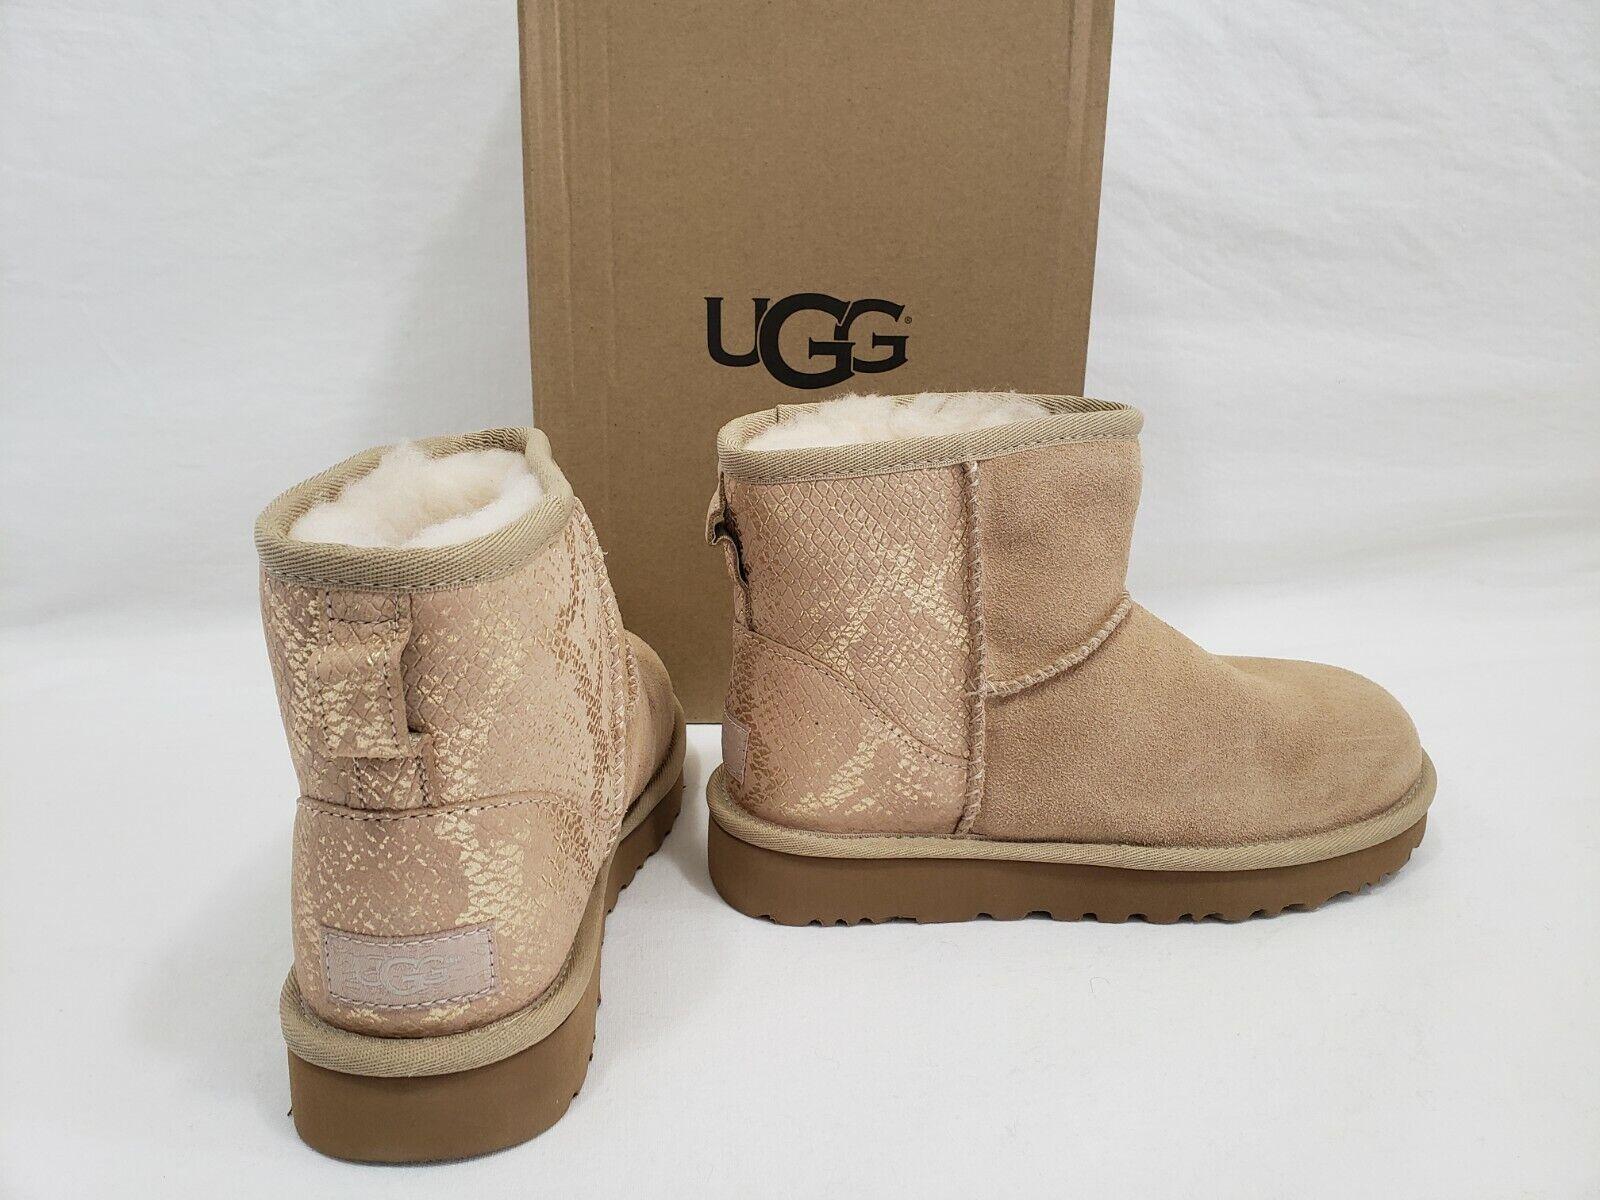 NIB UGG Classic Mini Metallic Gold Snake Beige Suede Boots W